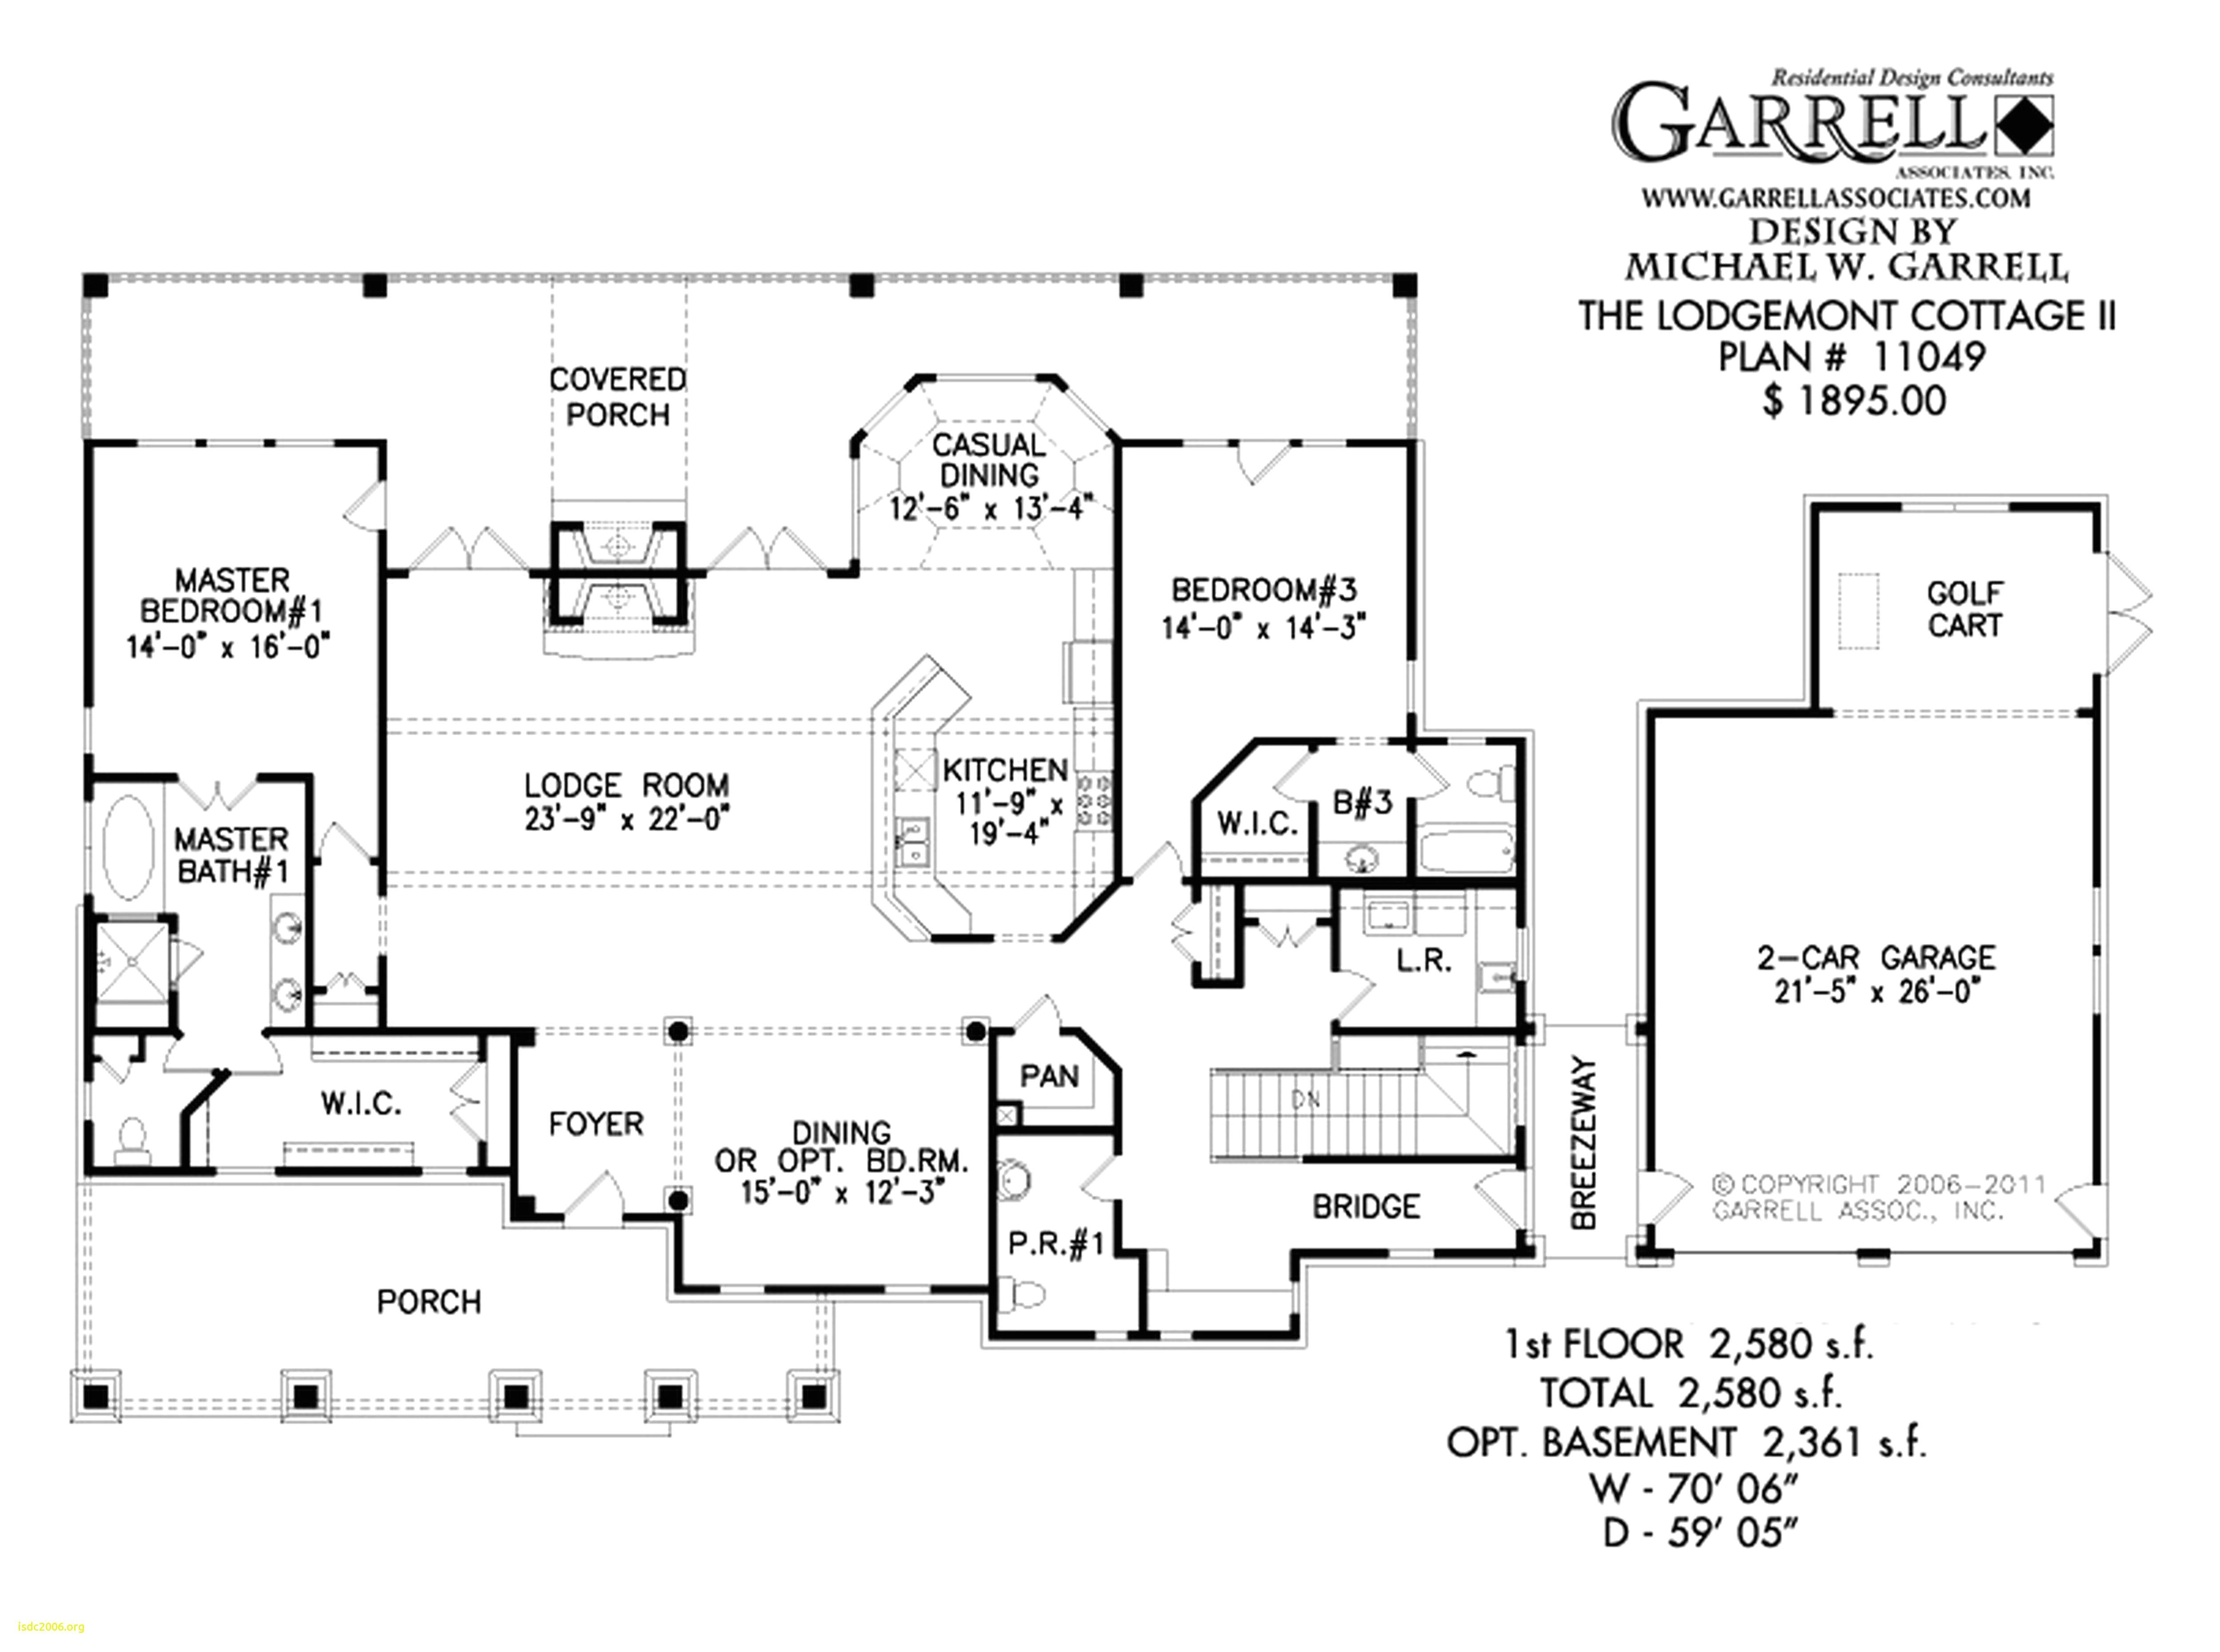 virtual house design unique house designer new s media cache ak0 pinimg originals 0d 13 65 of virtual house design jpg